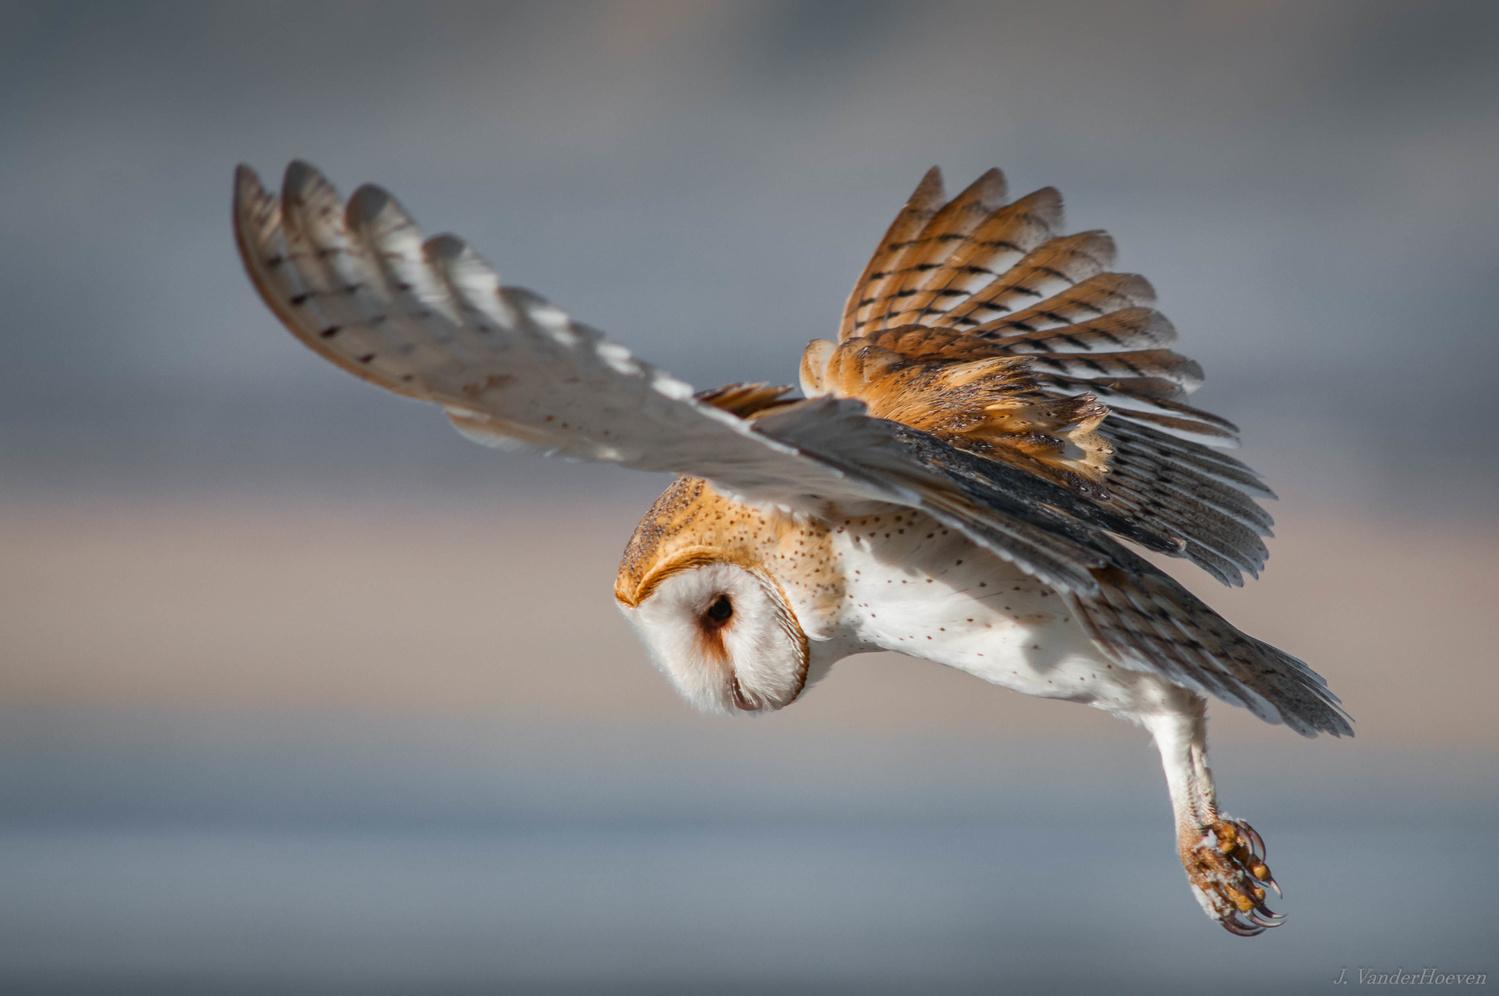 Hovering by Jake VanderHoeven